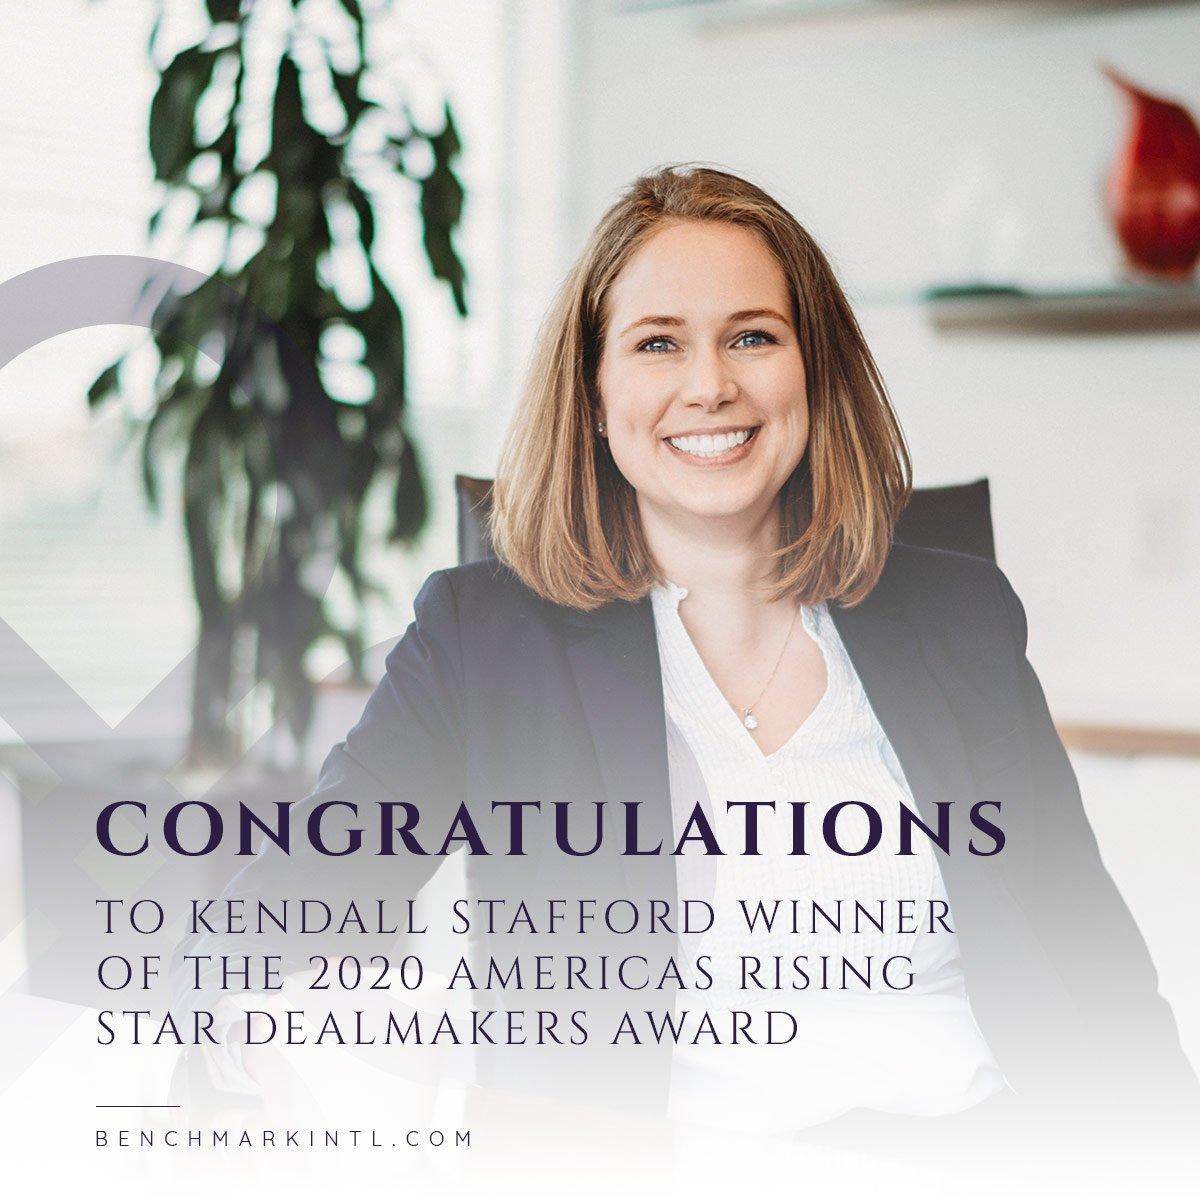 Kendall_Stafford_Winner_of_the_2020_Americas_Rising_Star_Dealmakers_Award_Social